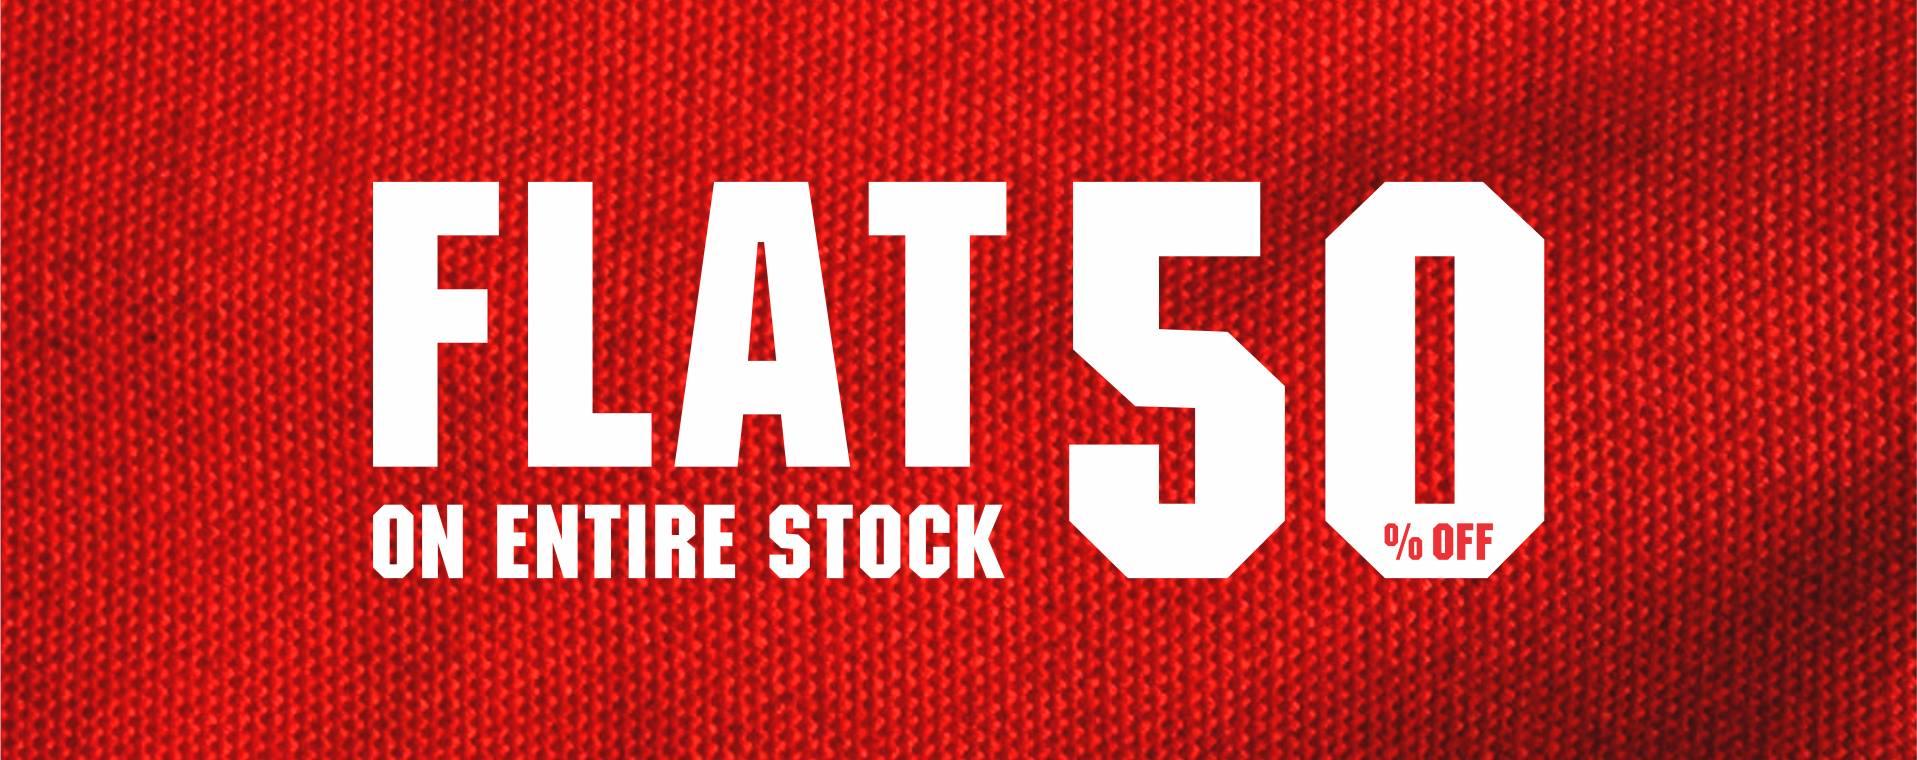 Cougar - Flat Sale